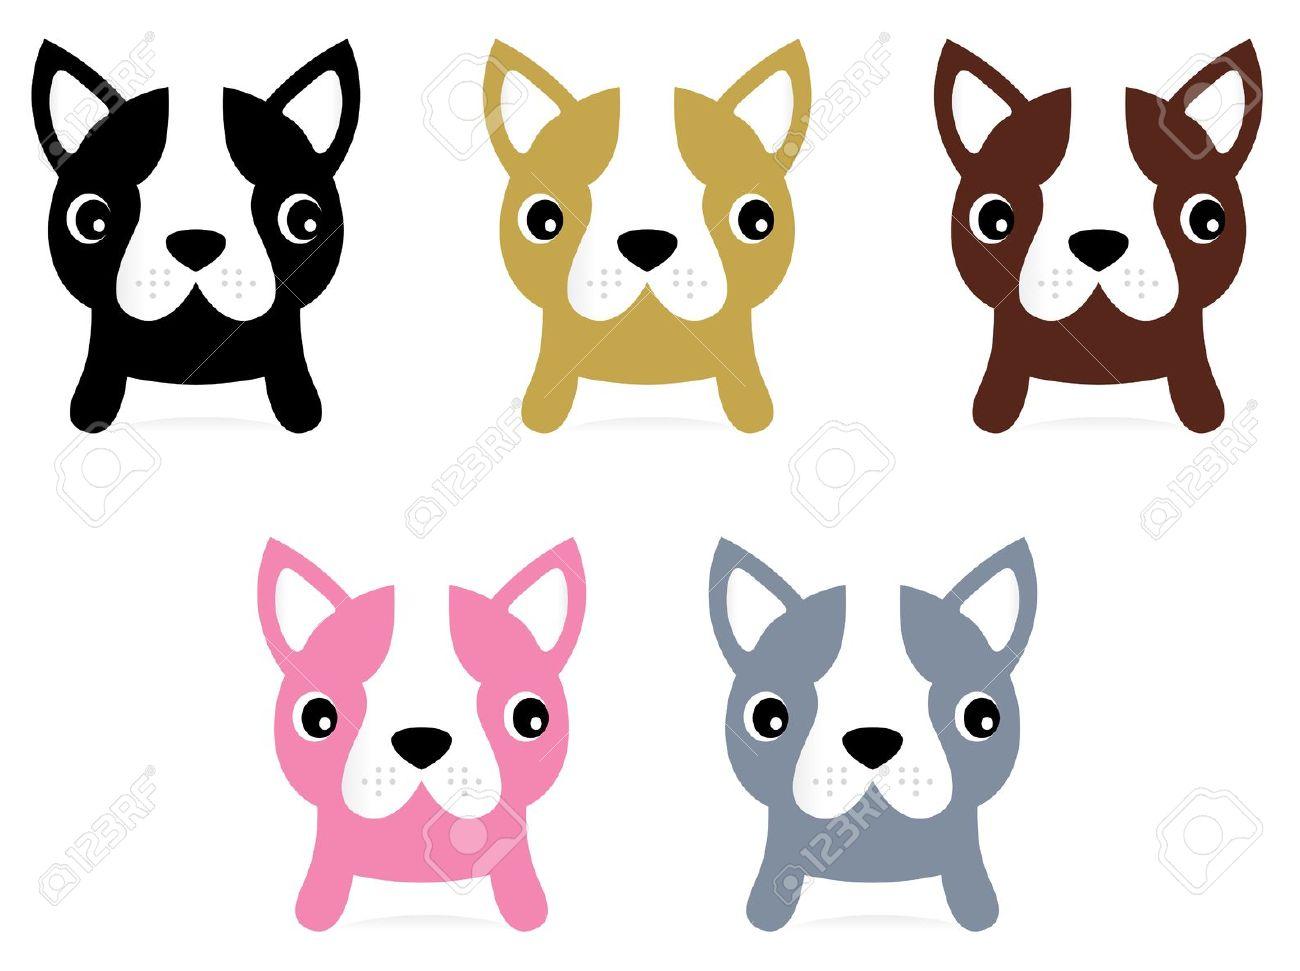 french bulldog: Adorable .-french bulldog: Adorable .-14